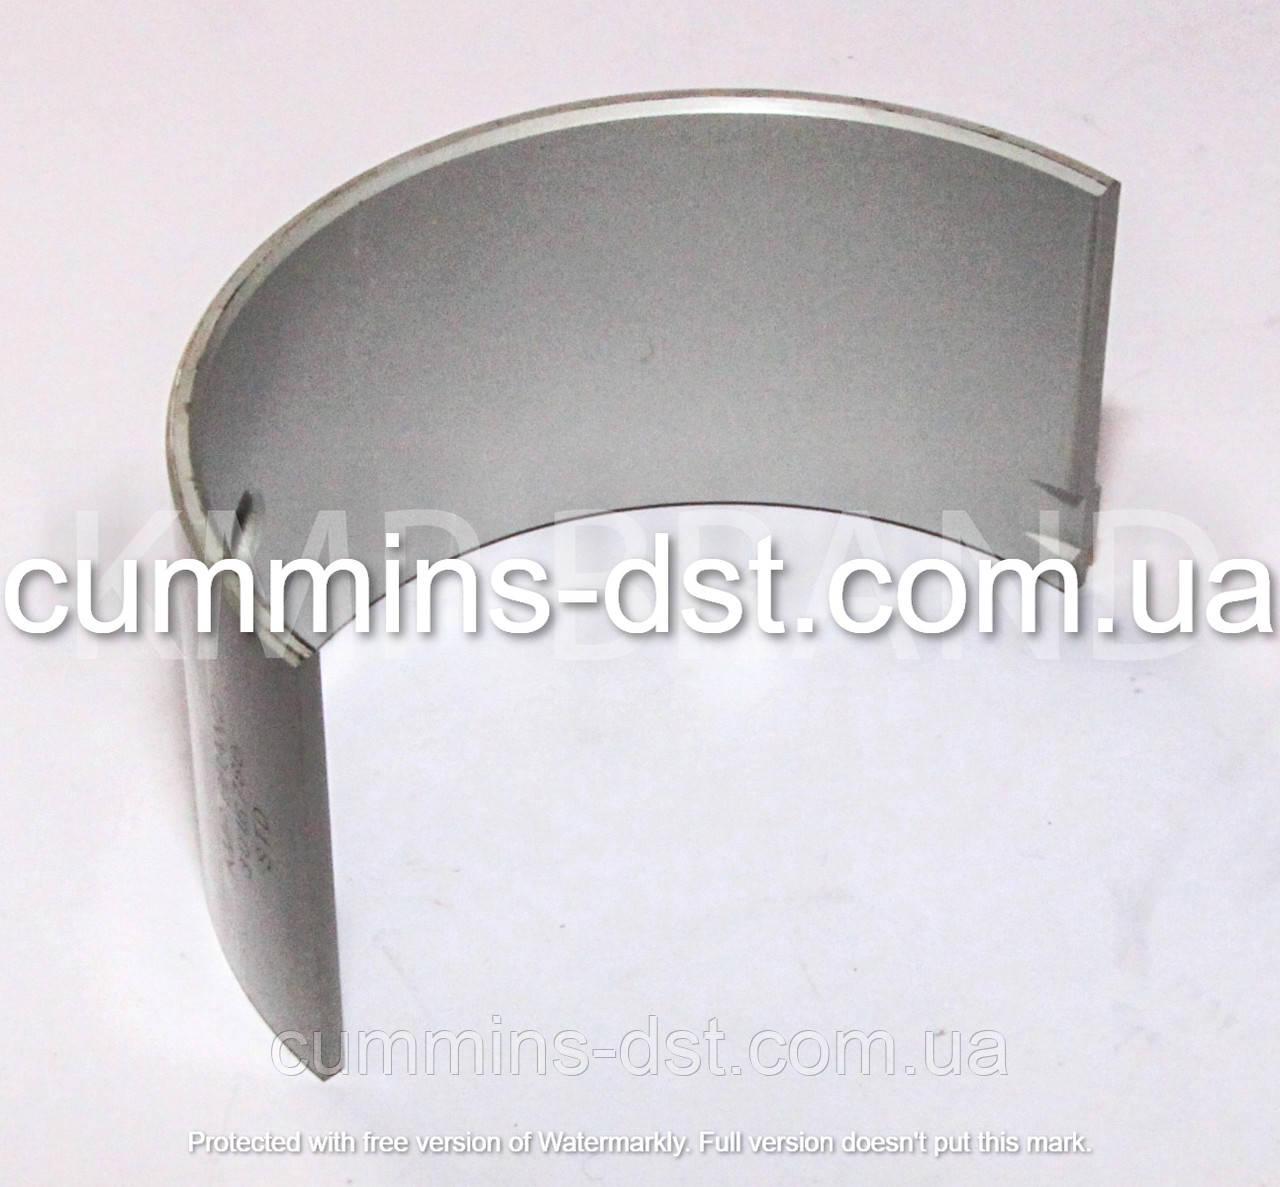 Вкладыши шатунные STD Cummins L10/M11/QSM11/ISM11